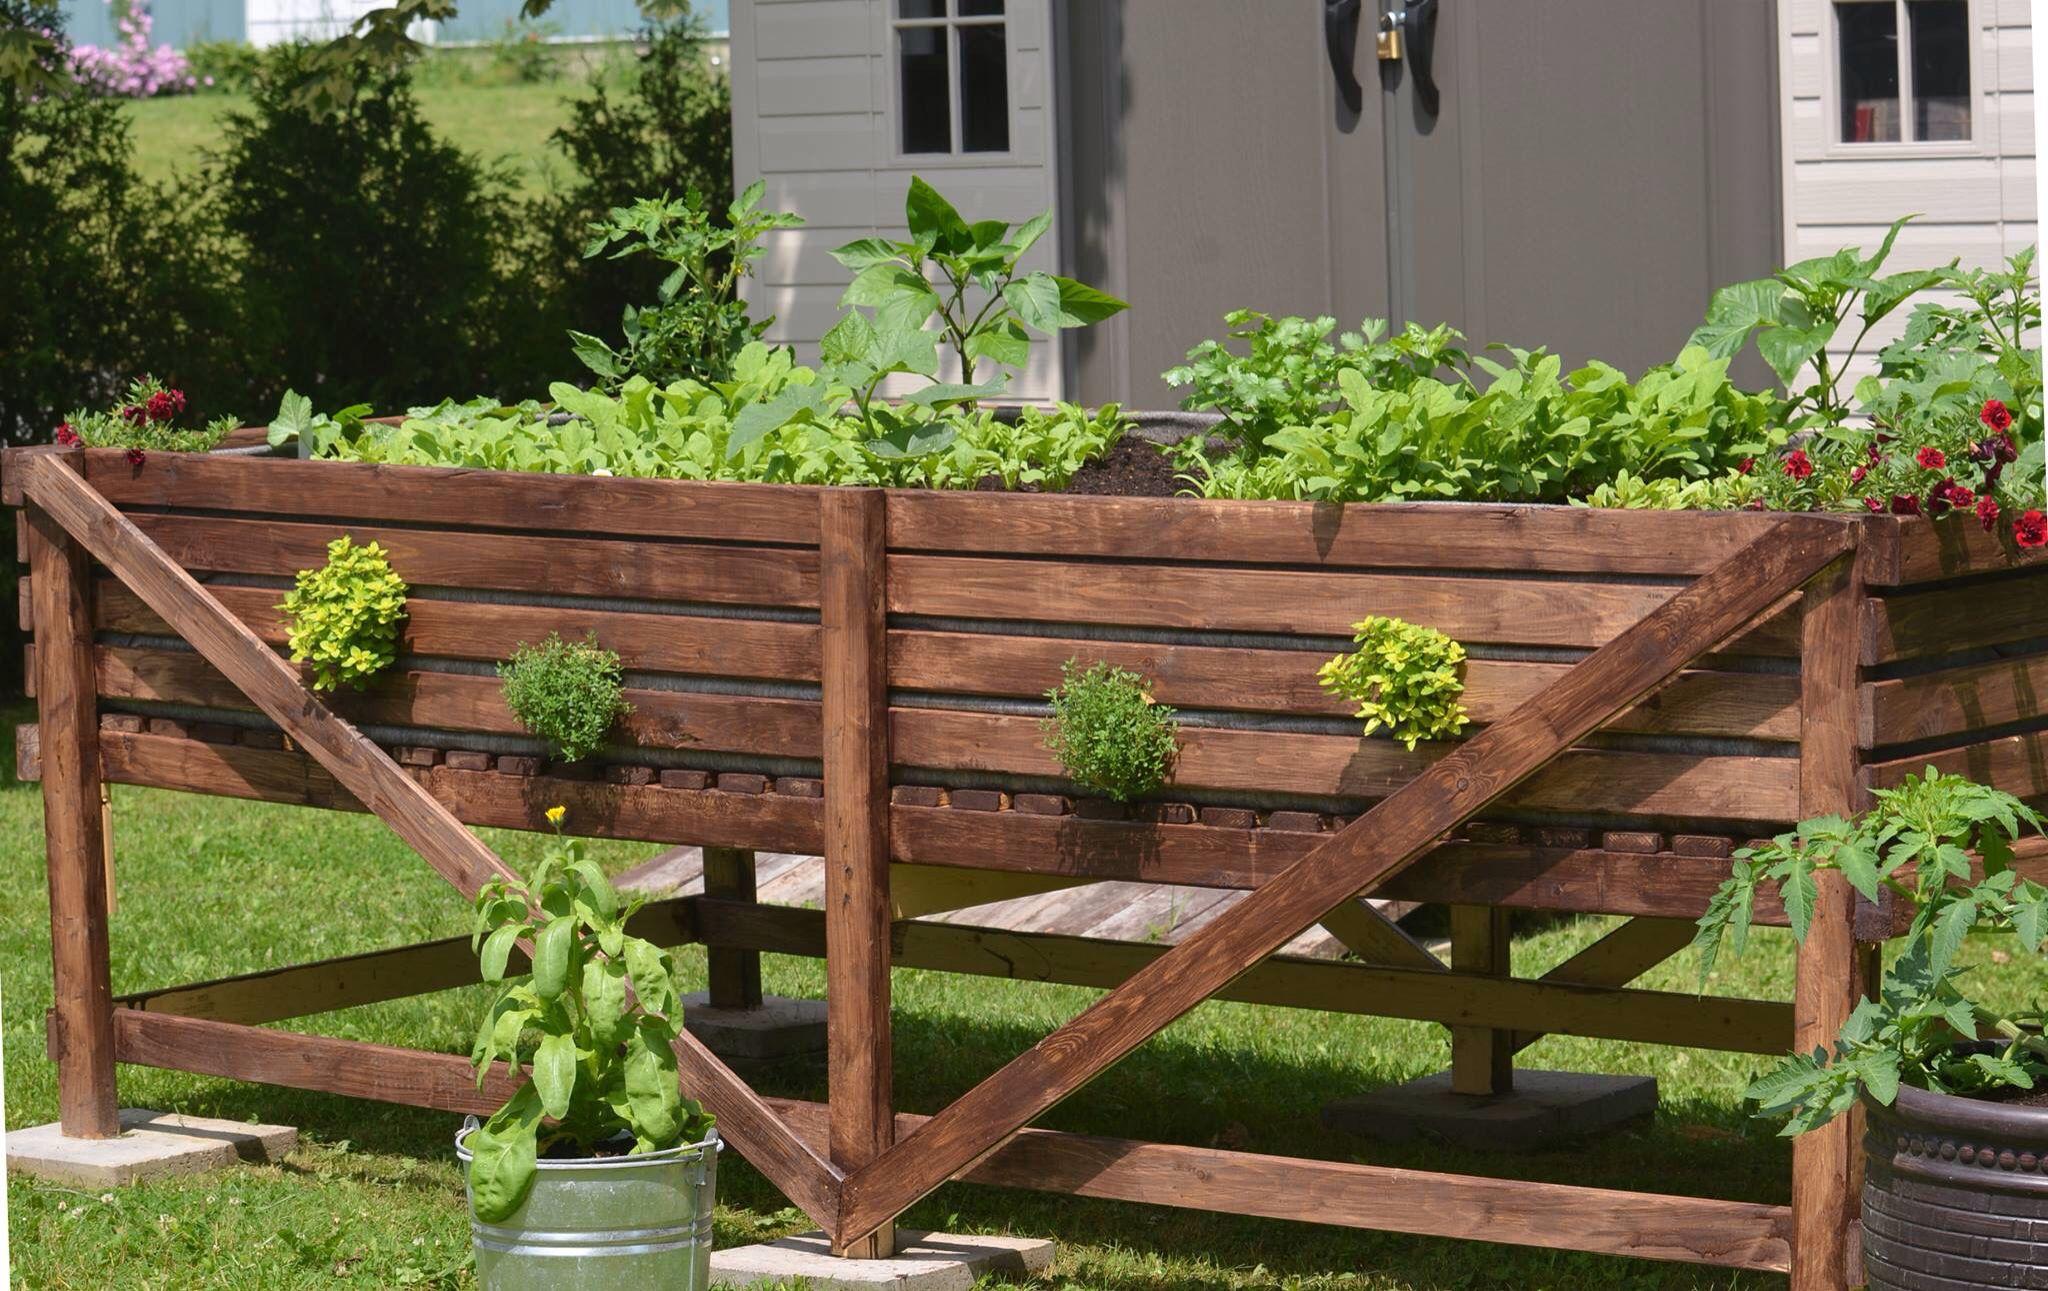 My little vegetable garden - Mon petit potager - Garden in a box ...